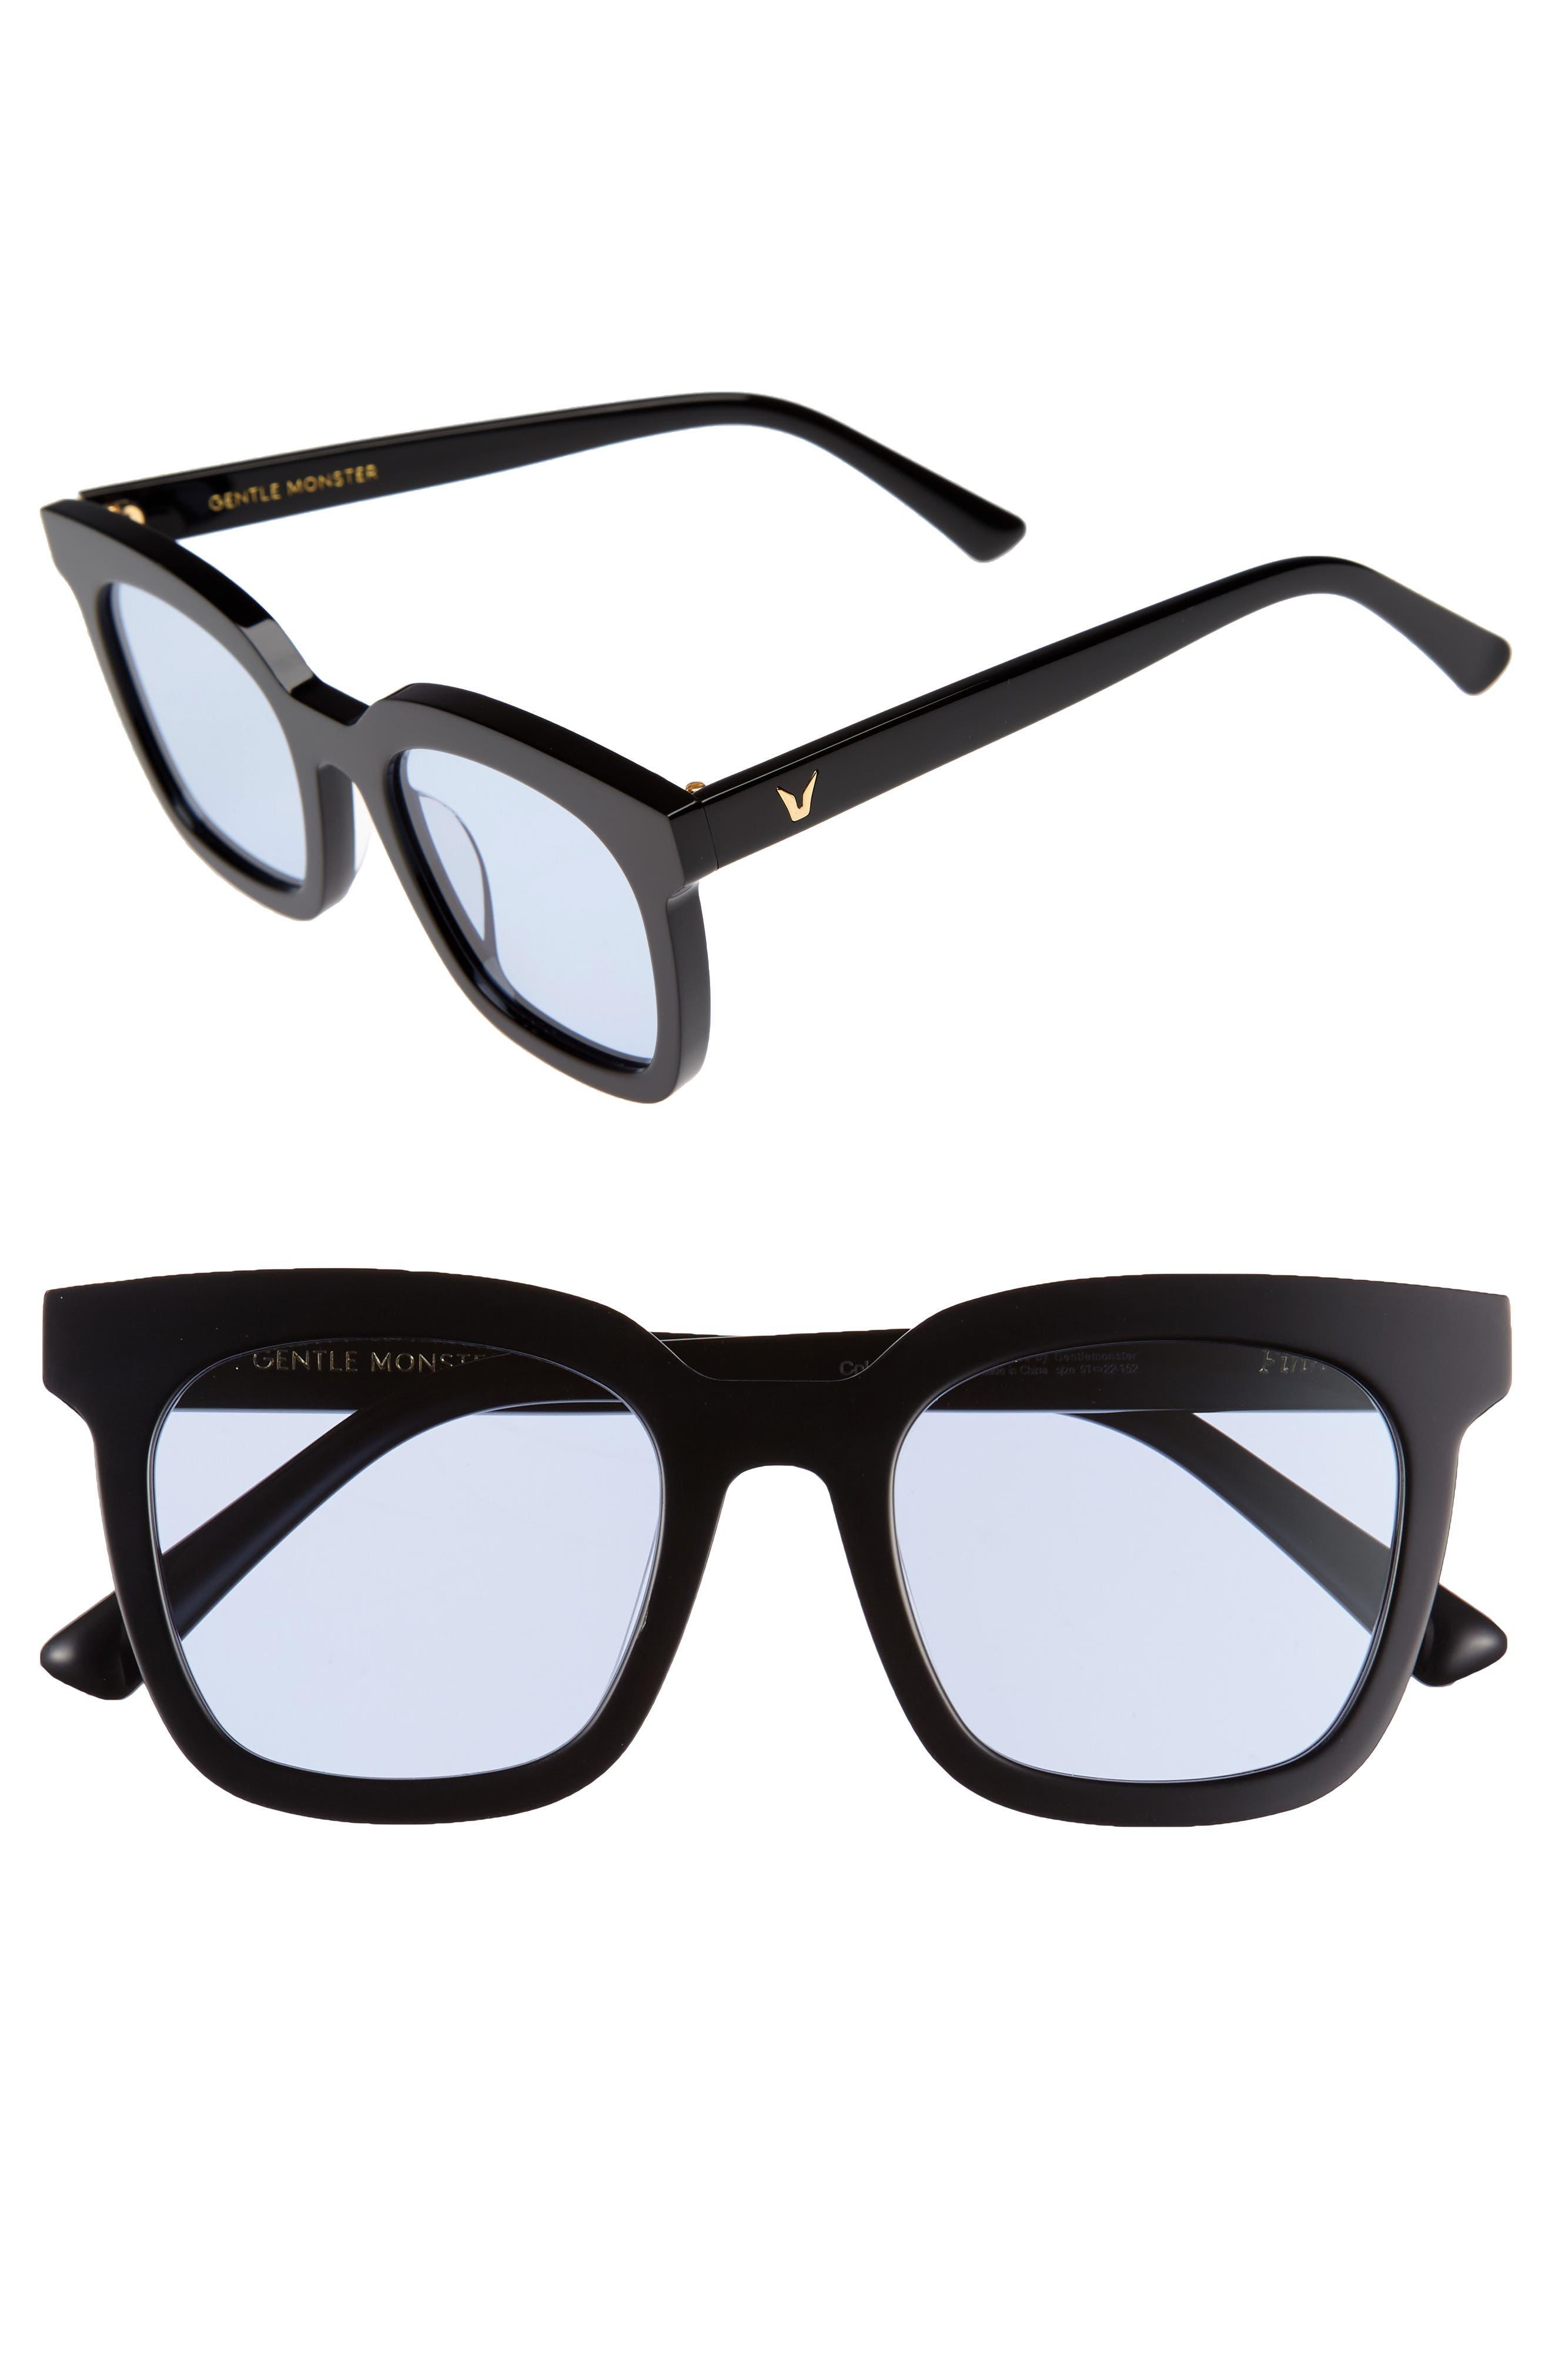 Finn 51mm Sunglasses,                         Main,                         color, Black/ Blue